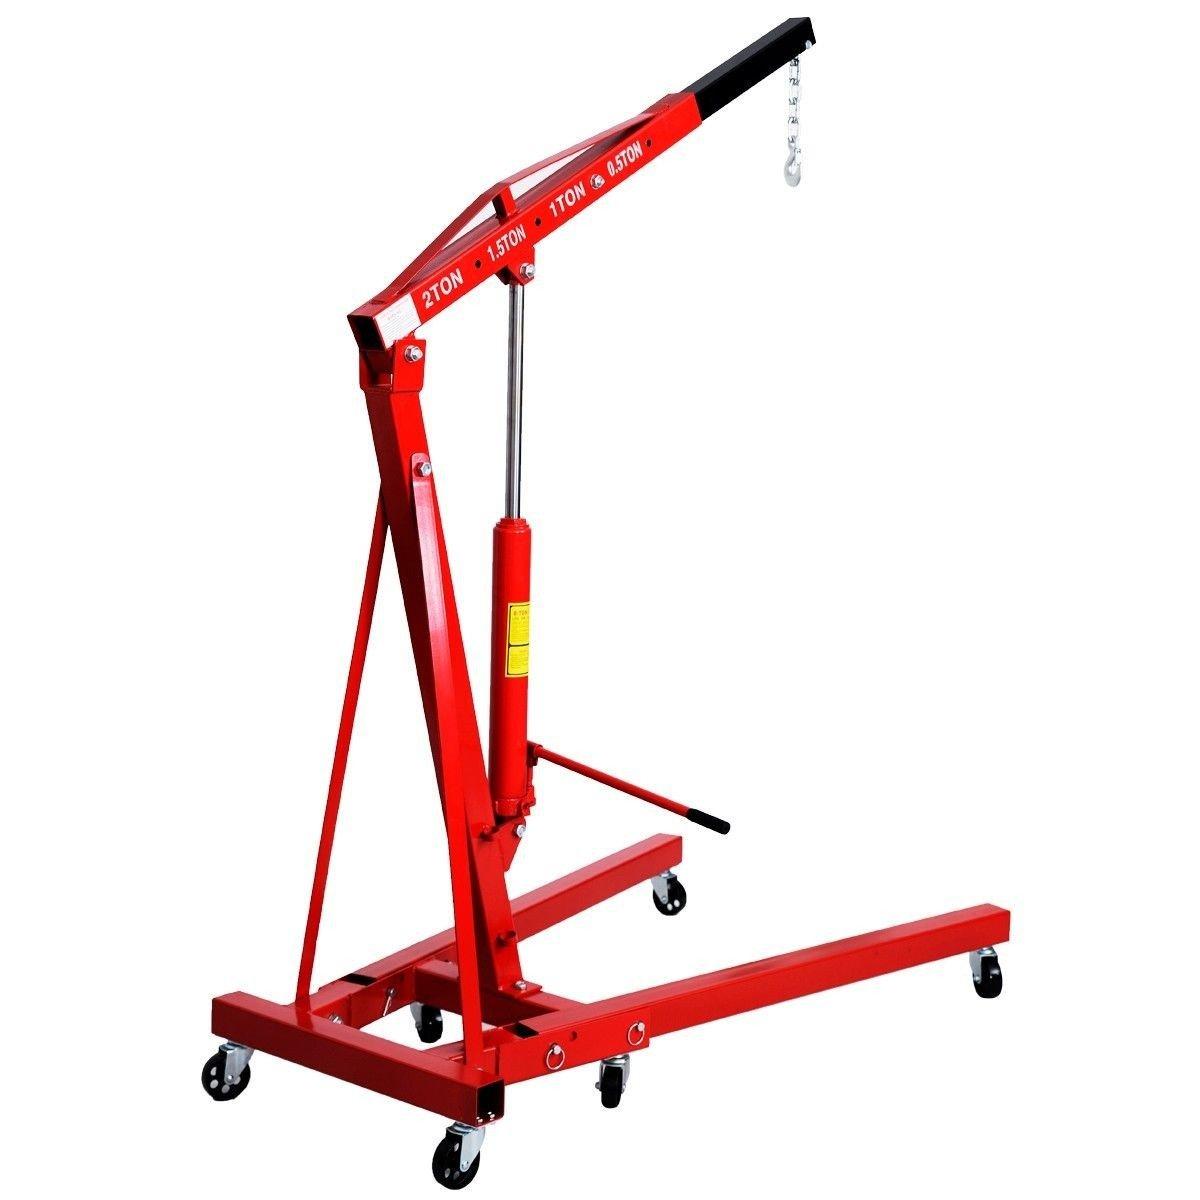 2 TON Red Color 4000 lb Engine Motor Hoist Cherry Picker Shop Crane Lift New Ton Adjustable Height Black Tool Us Pump Cherry Picker Hoist Pneumatic Useful BESTChoiceForYou